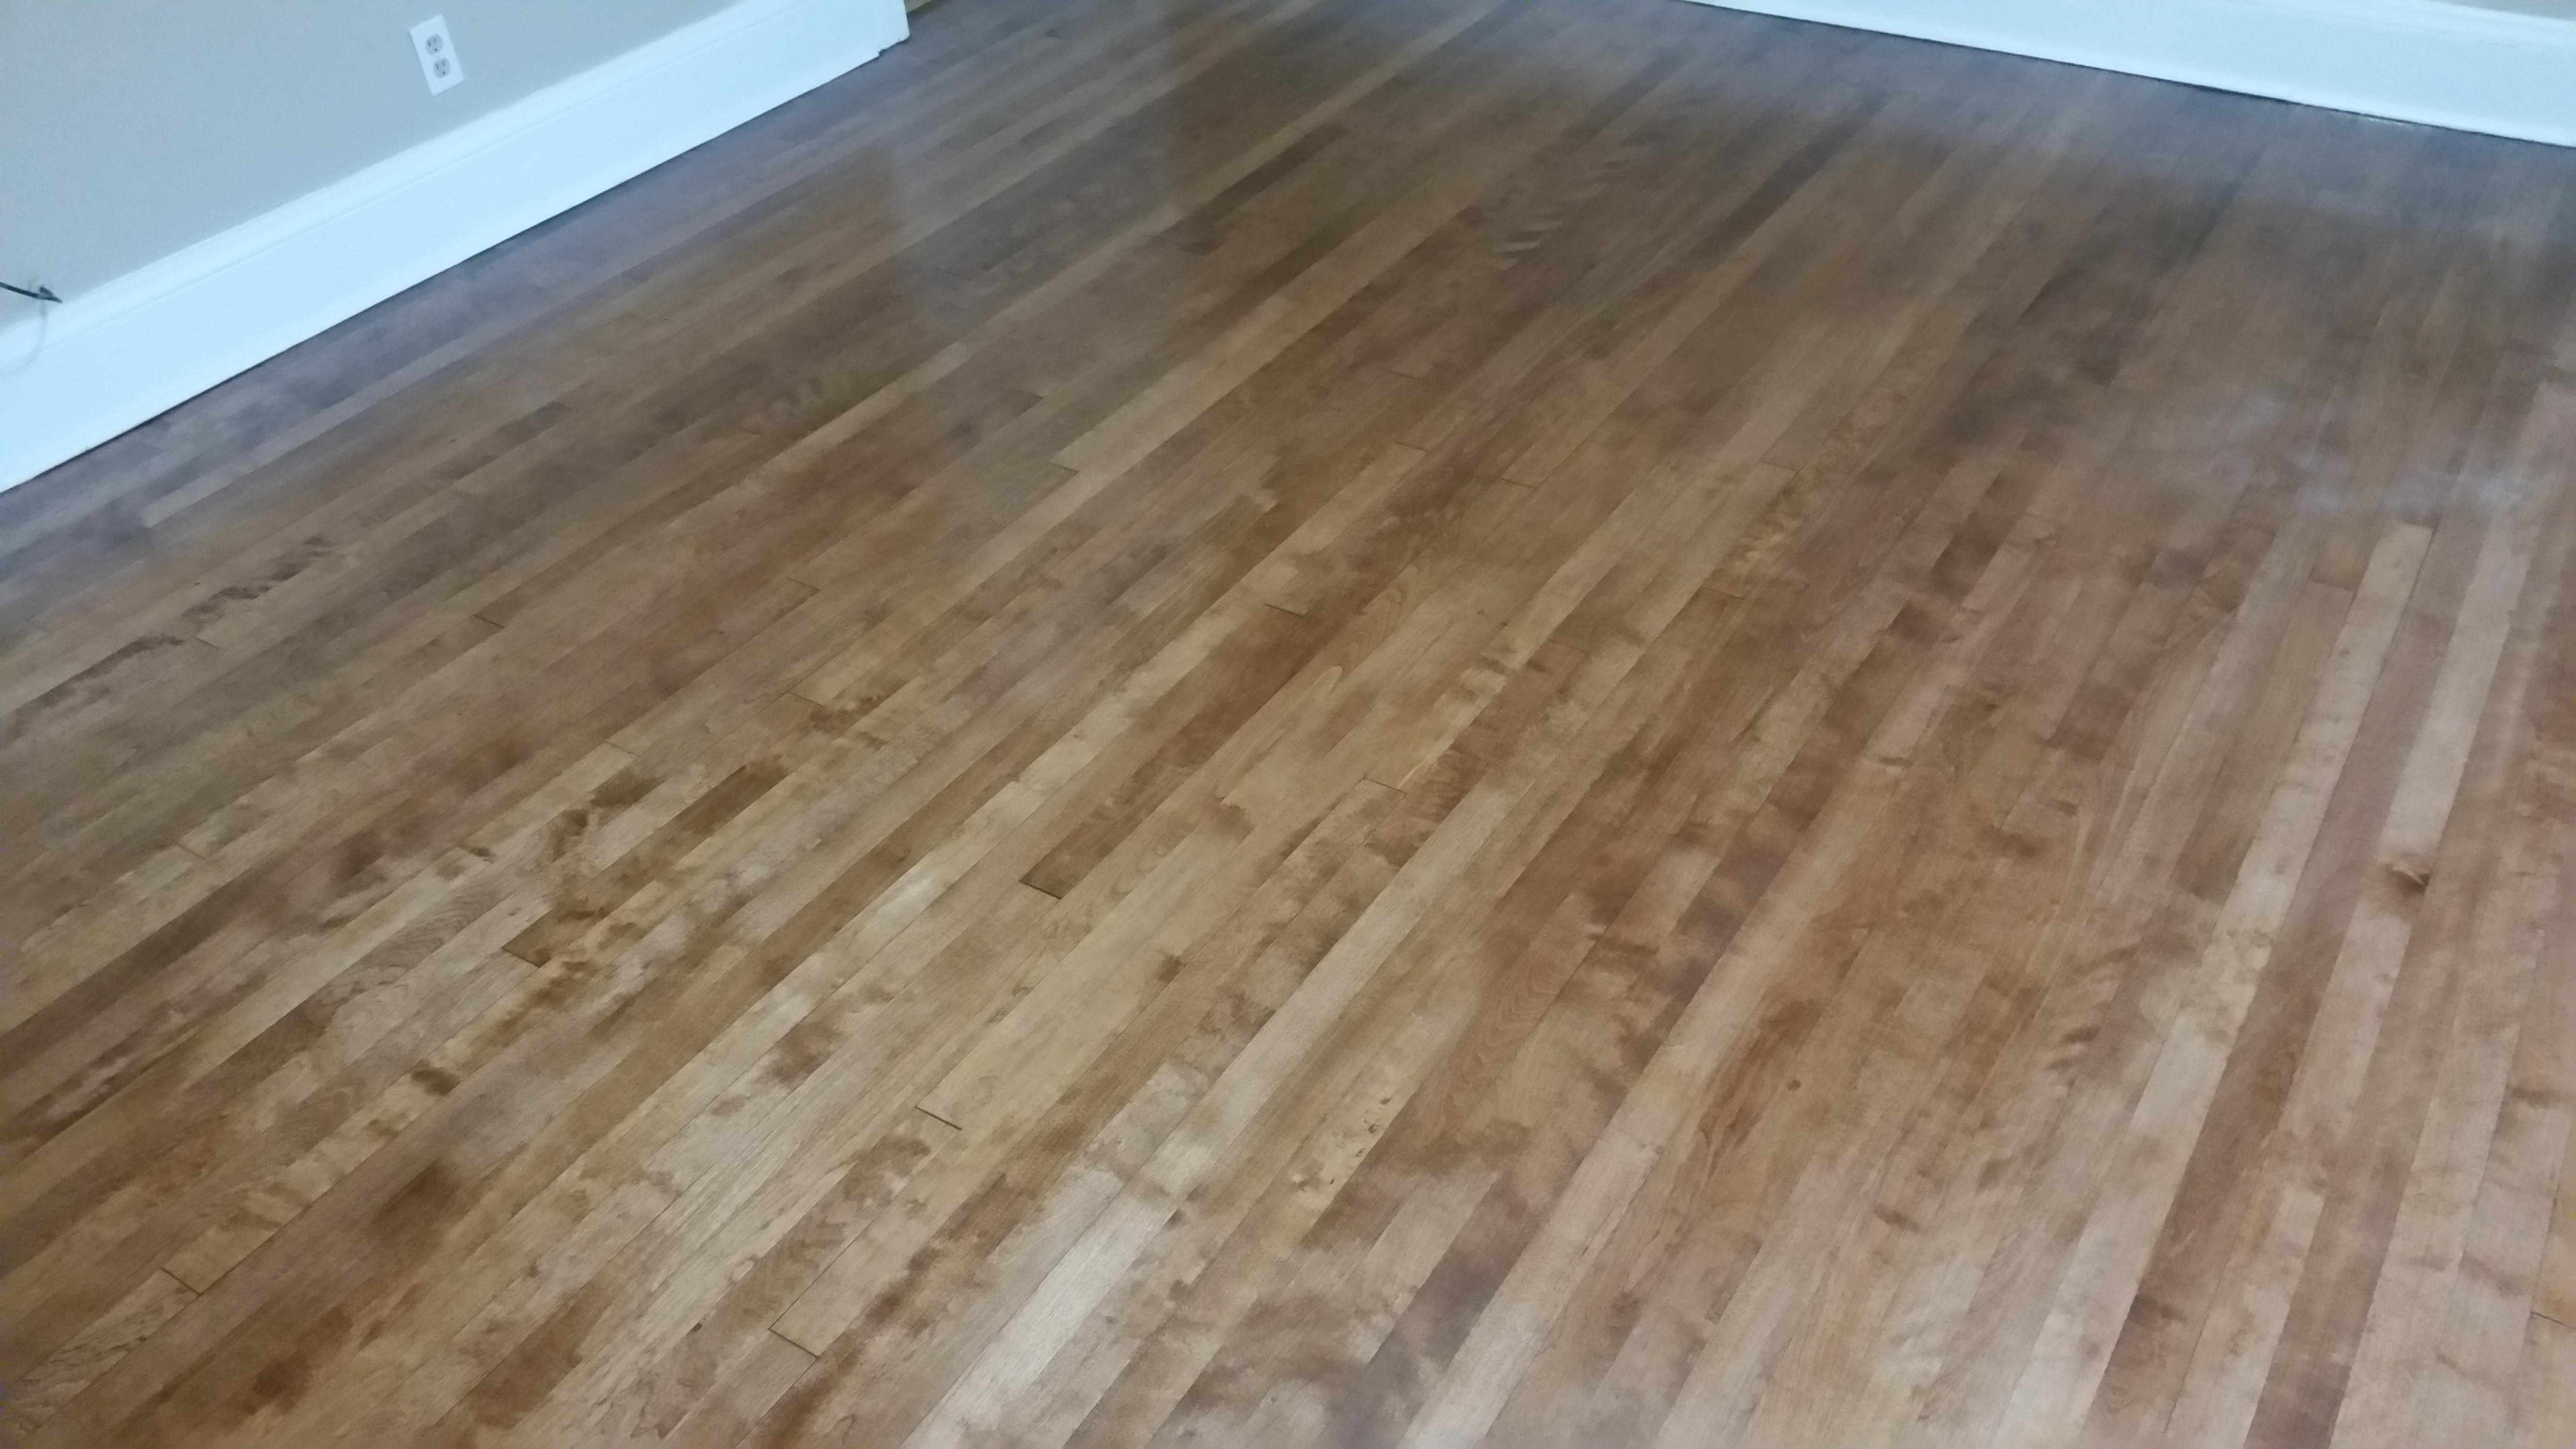 hardwood flooring for sale online of rochester hardwood floors of utica home with 20151028 104648 20160520 161308resize